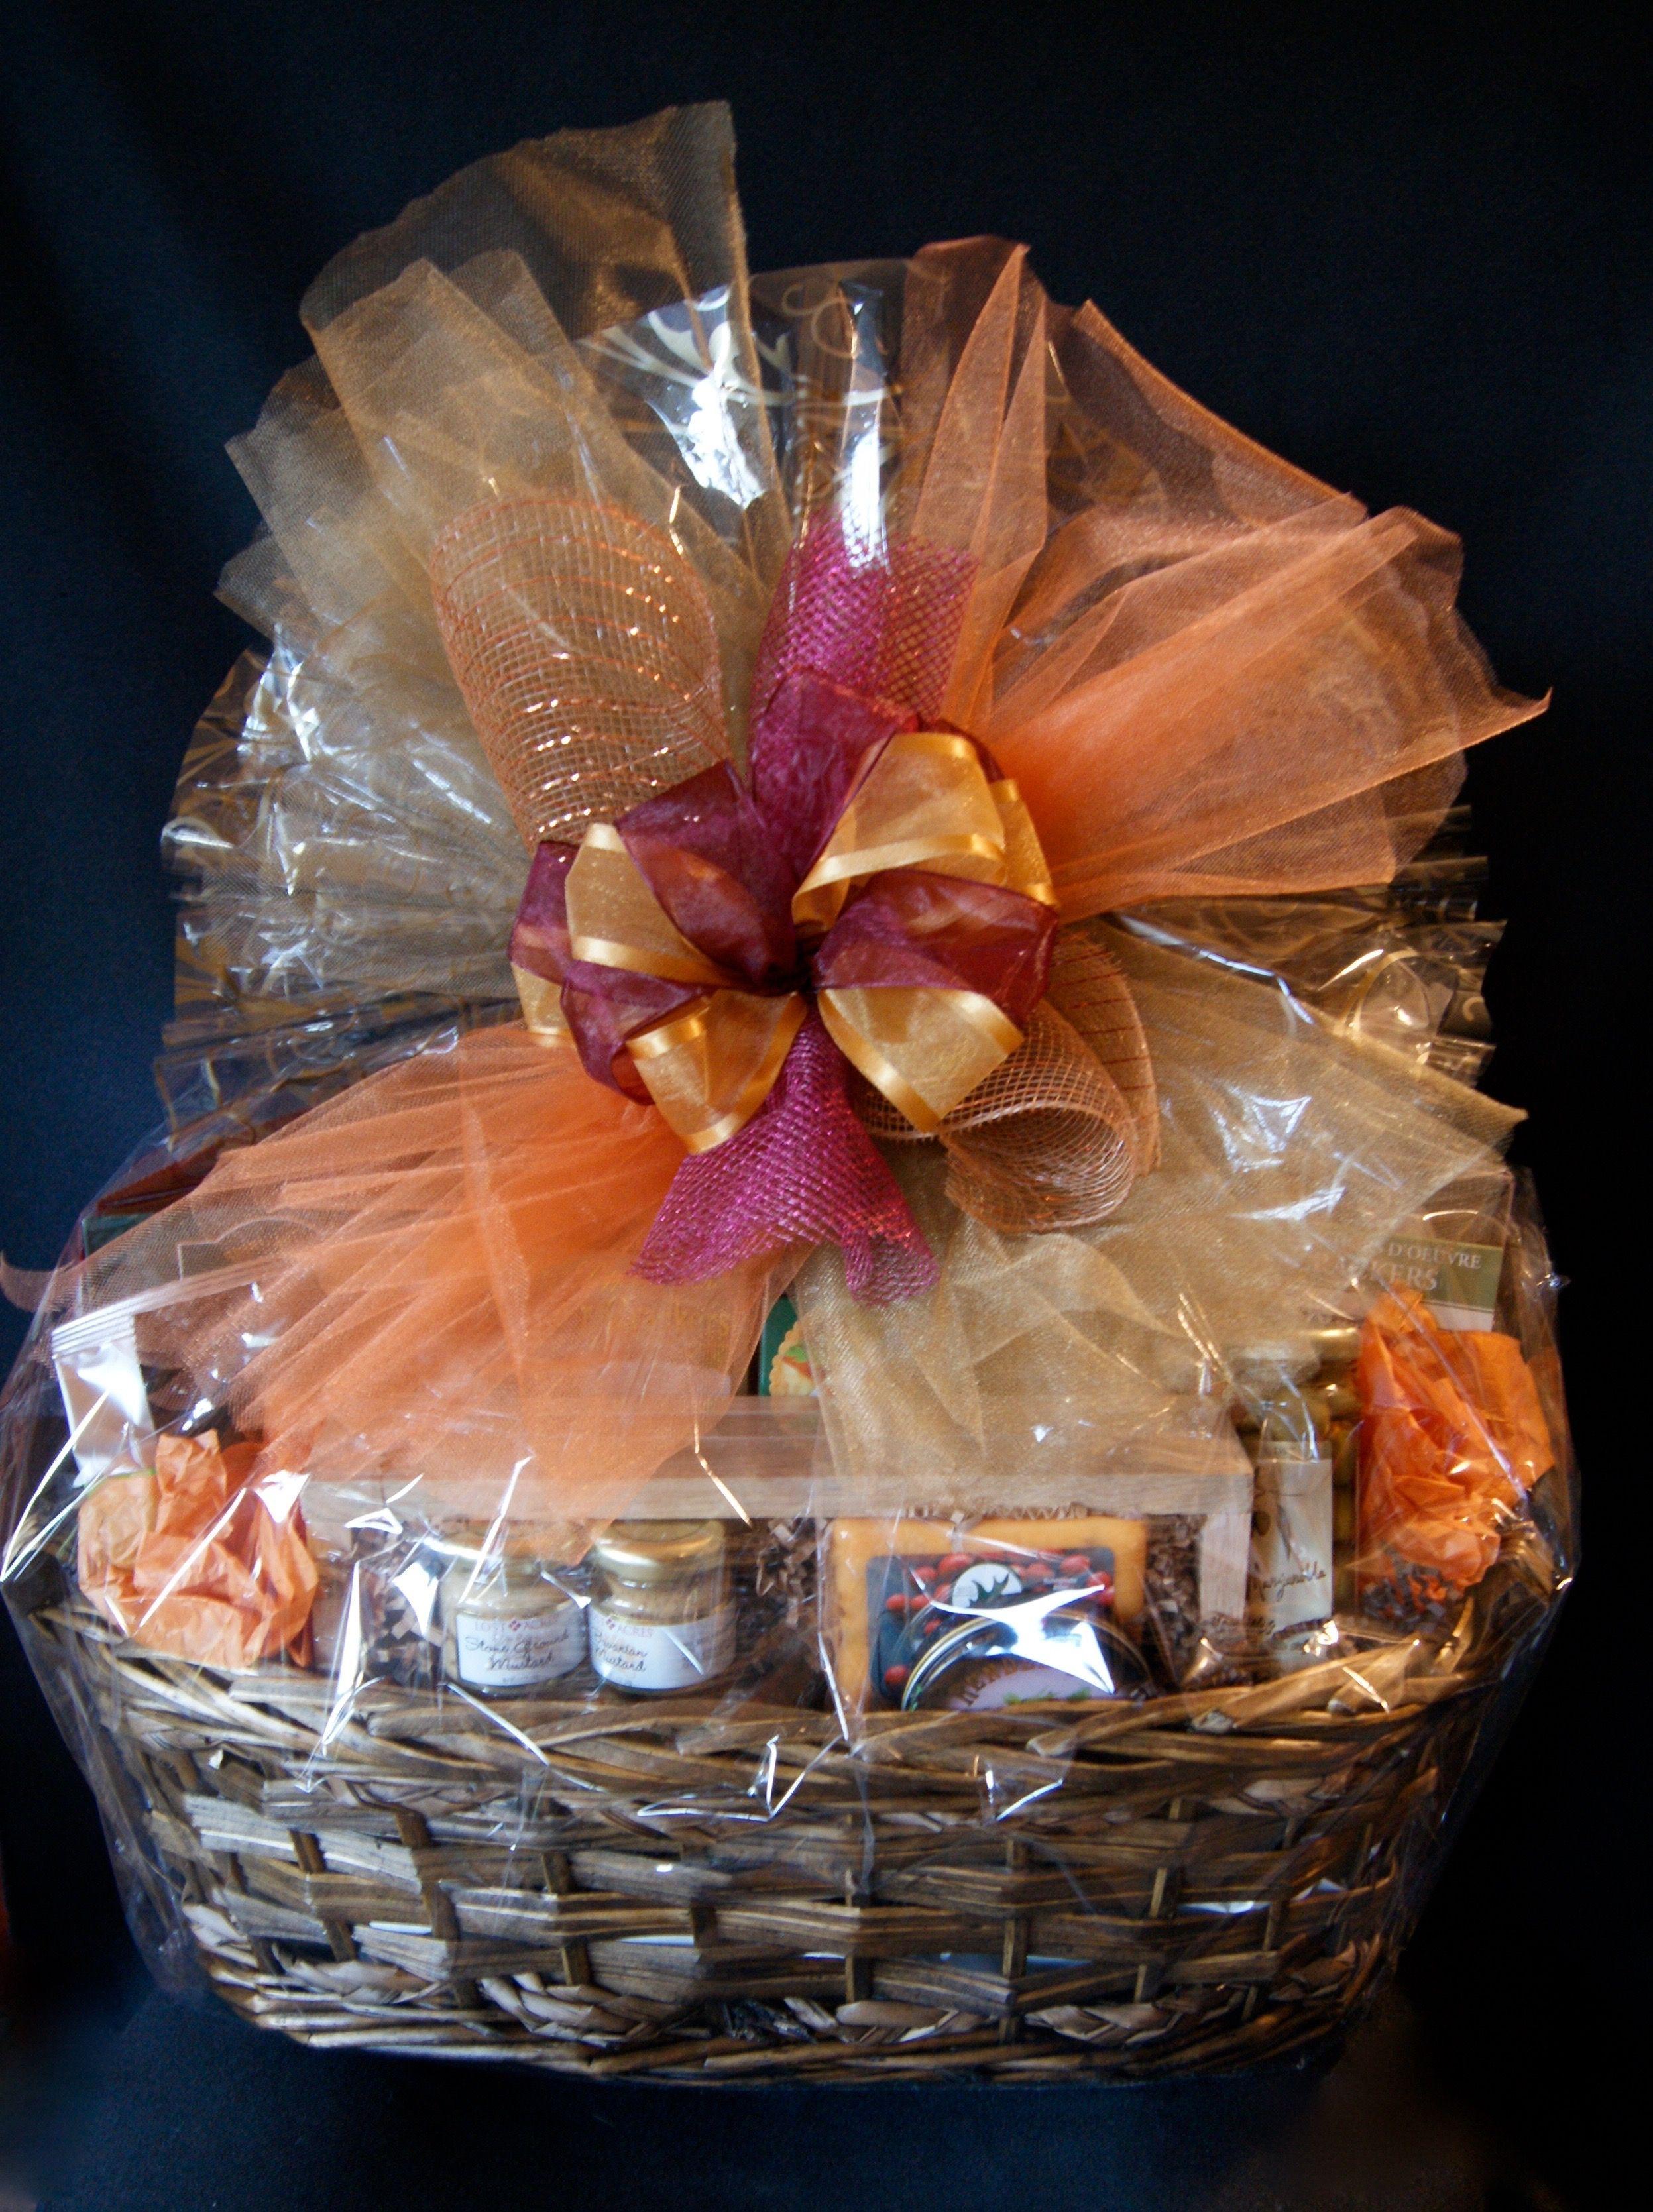 Seasonal Decoration On Extra Large Gourmet Gift Basket Designed For Wellington Florist Fruit Basket Gift Corporate Gift Baskets Luxury Gift Basket